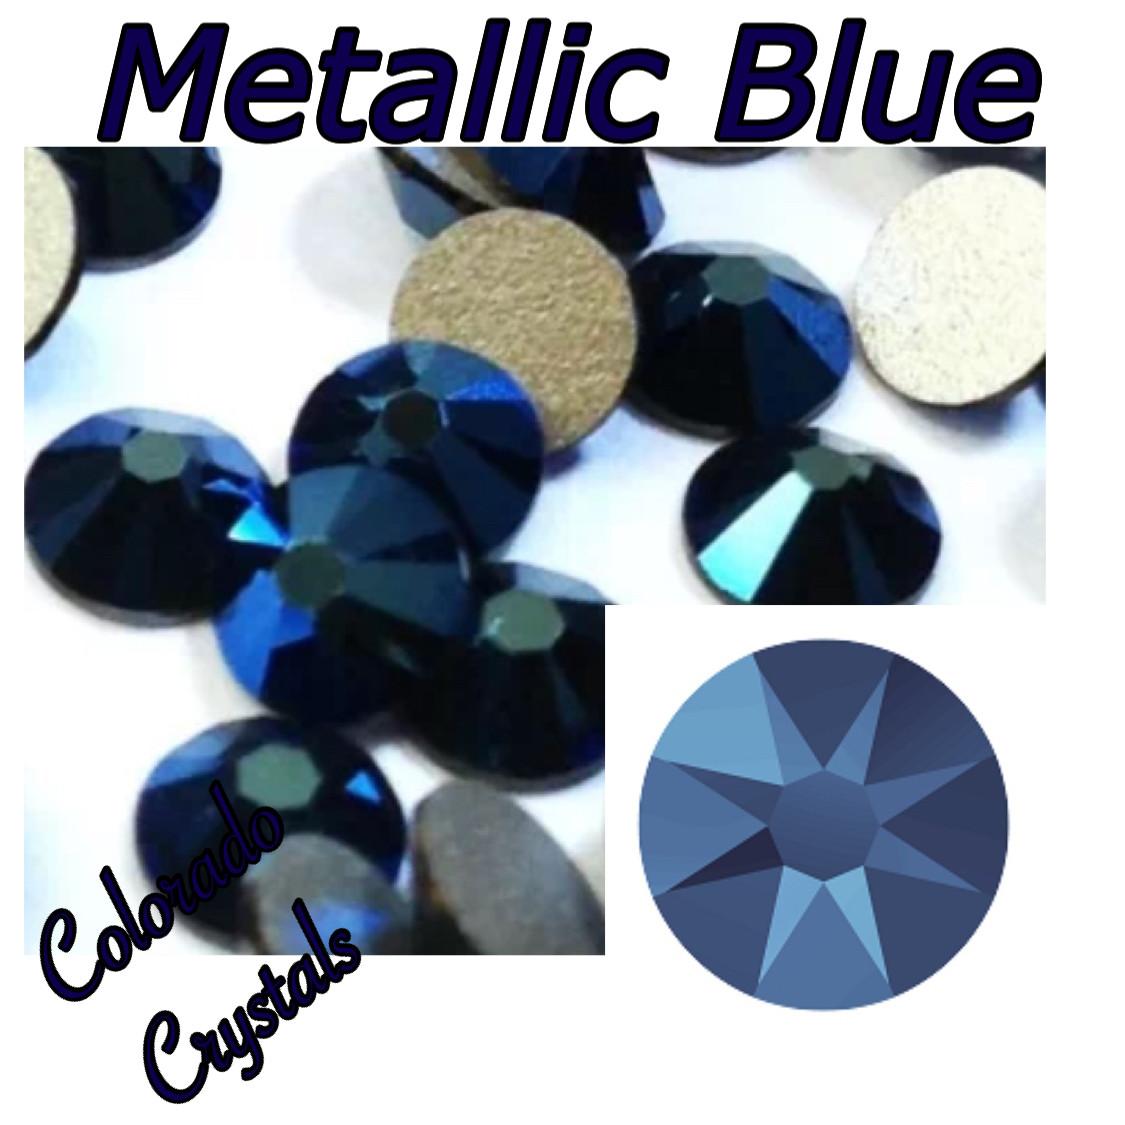 Metallic Blue (Crystal) 30ss 2088